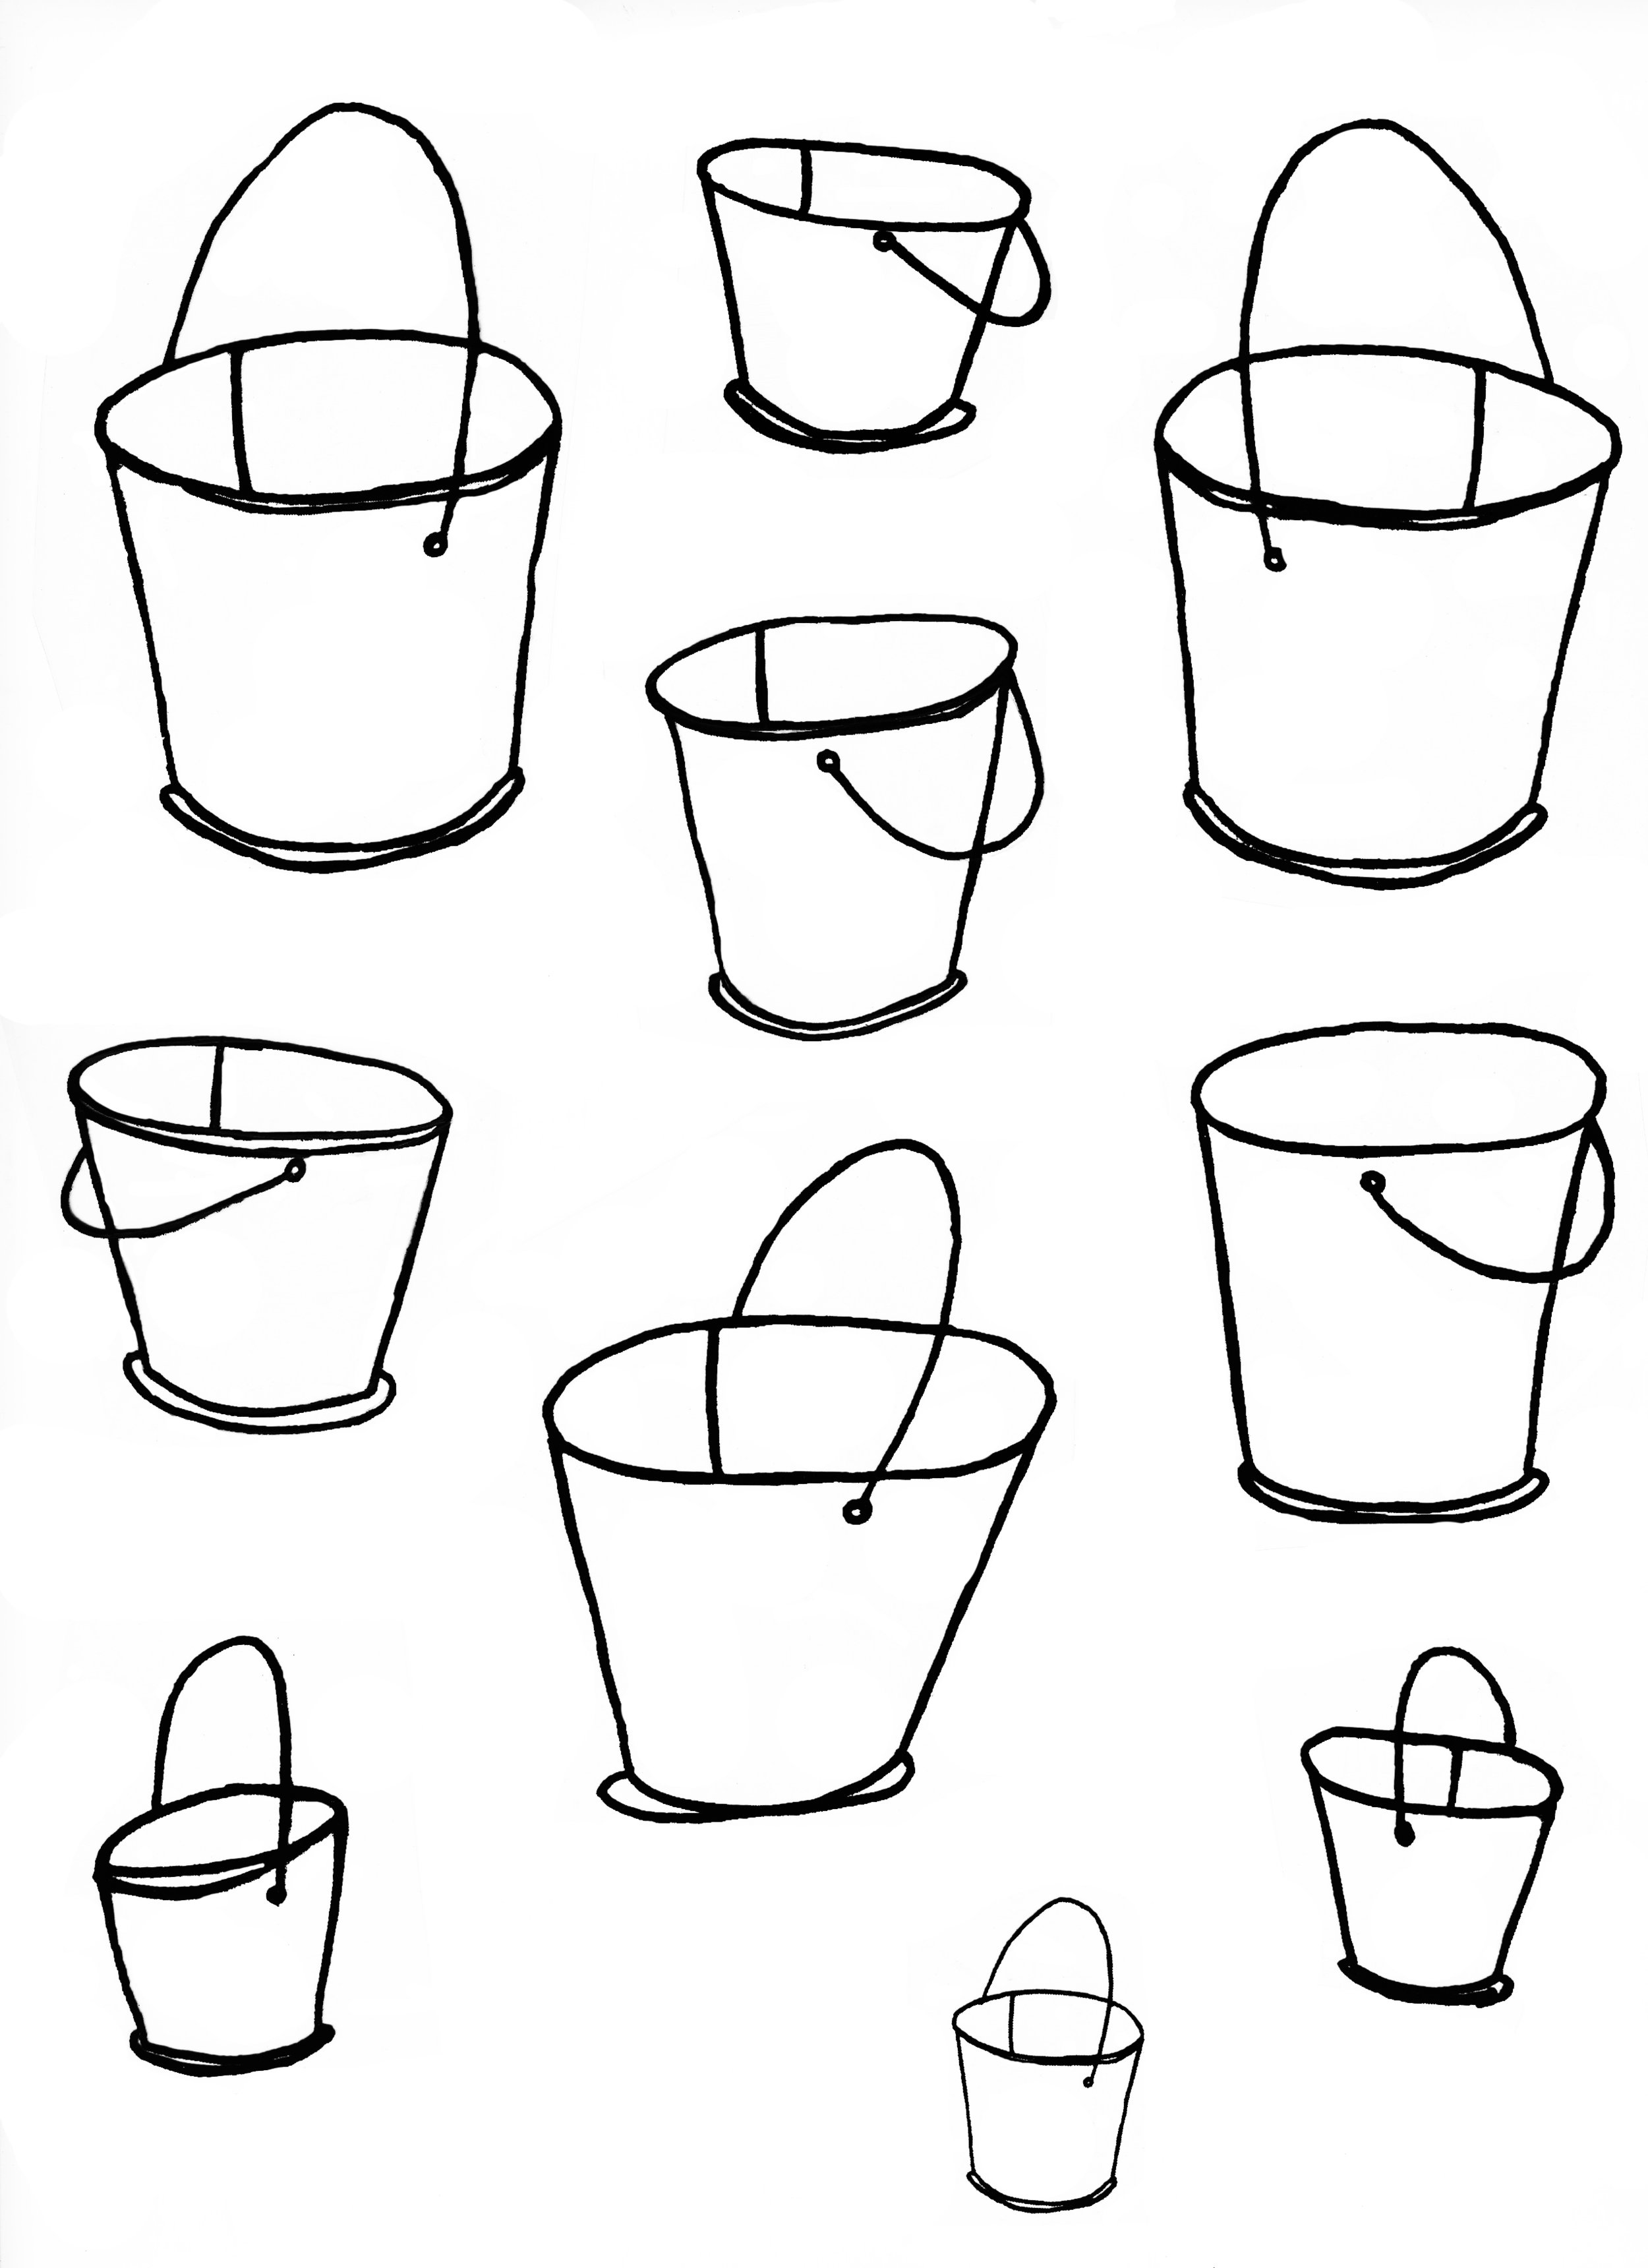 47_buckets.jpg